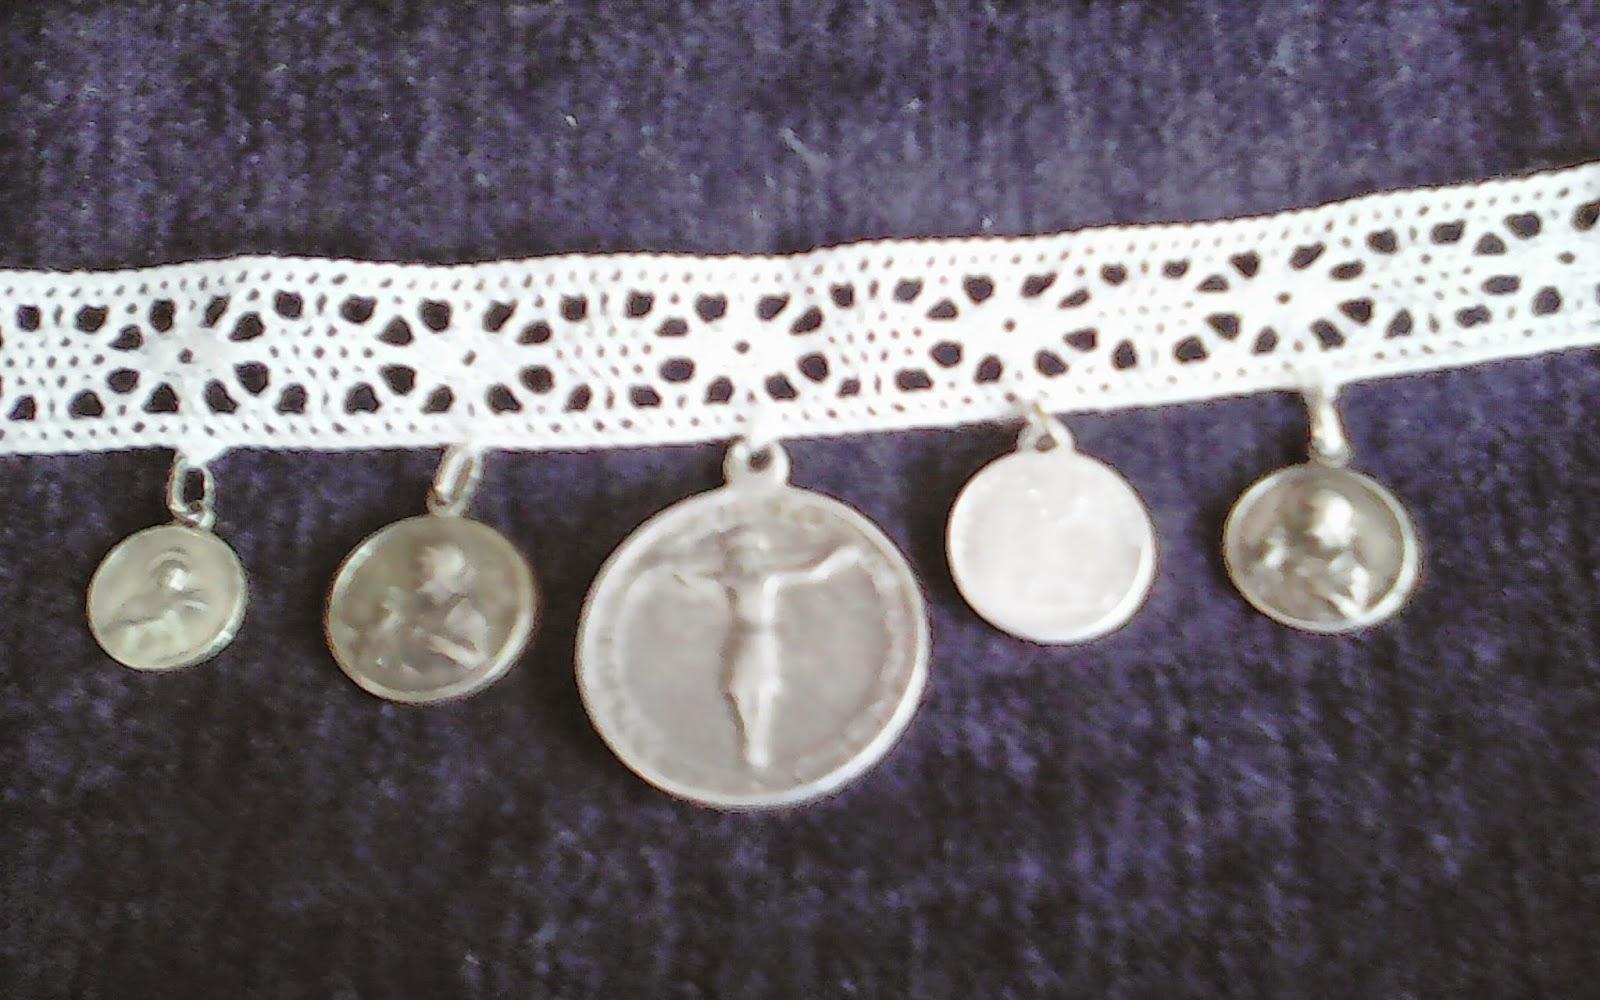 O desv n vintage do pereiro medallas religiosas - Desvan vintage ...